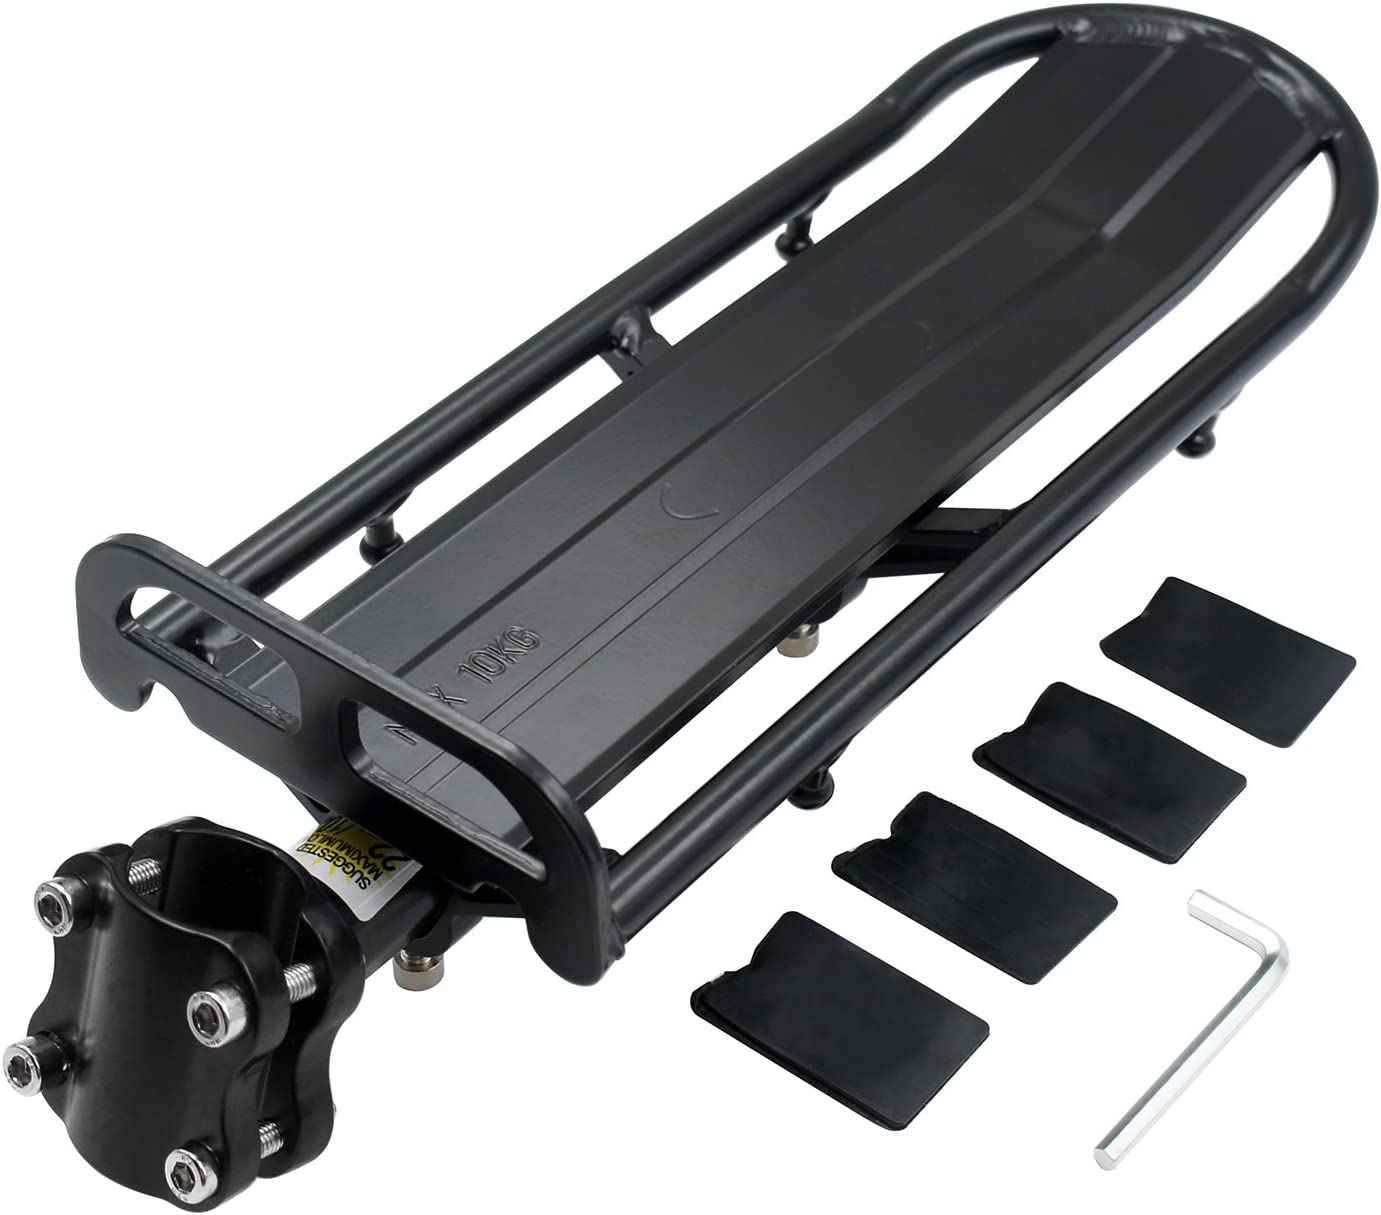 Aluminum Alloy Bicycle Back Rear Seat Rack Bracket Frame Luggage Carrier Holder